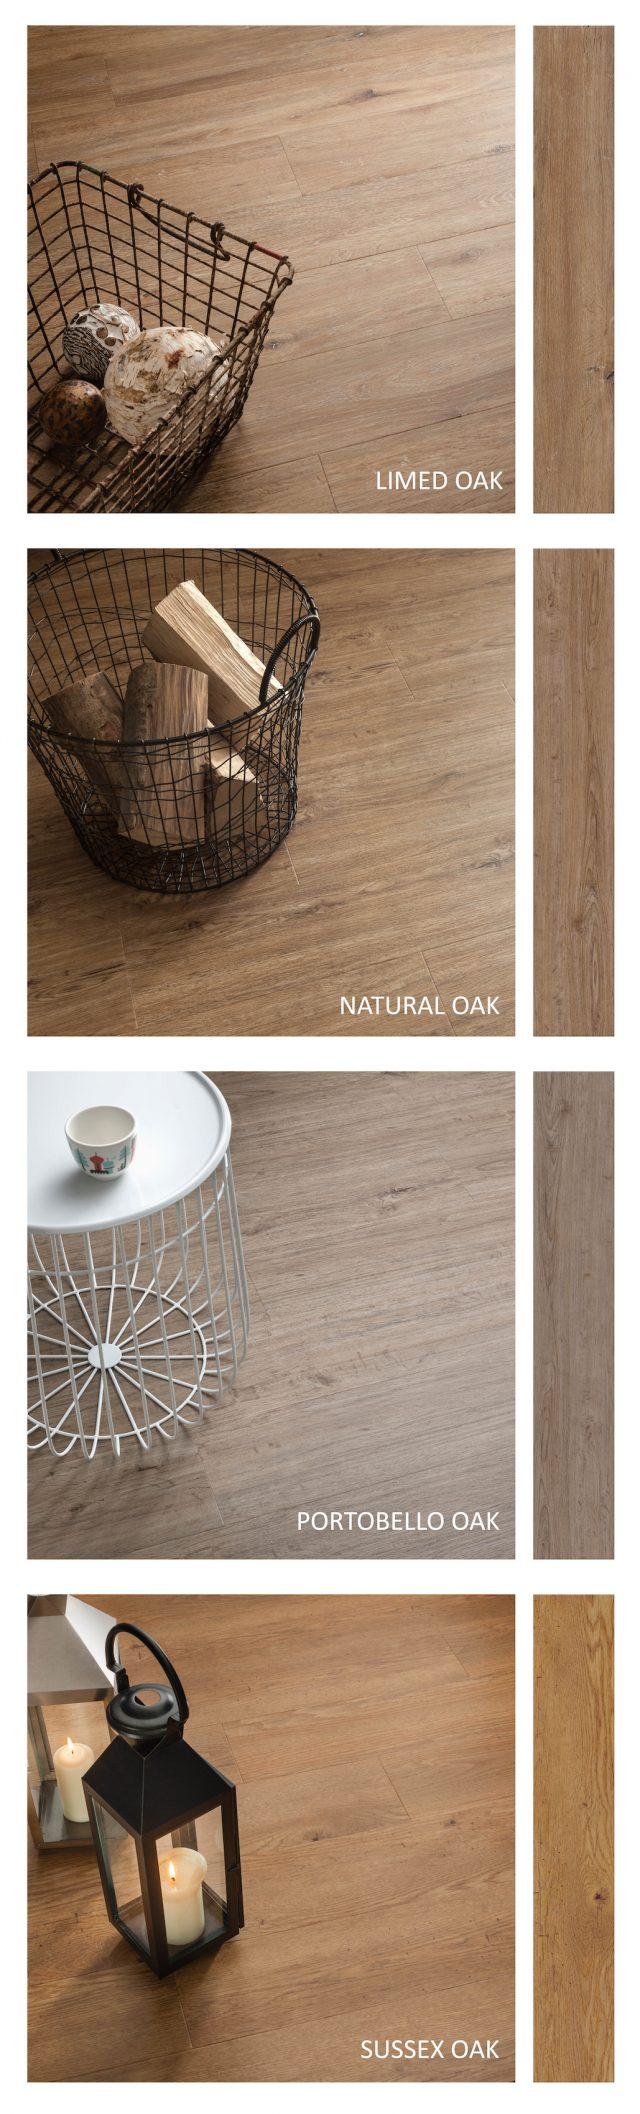 wooden vinyl flooring samples